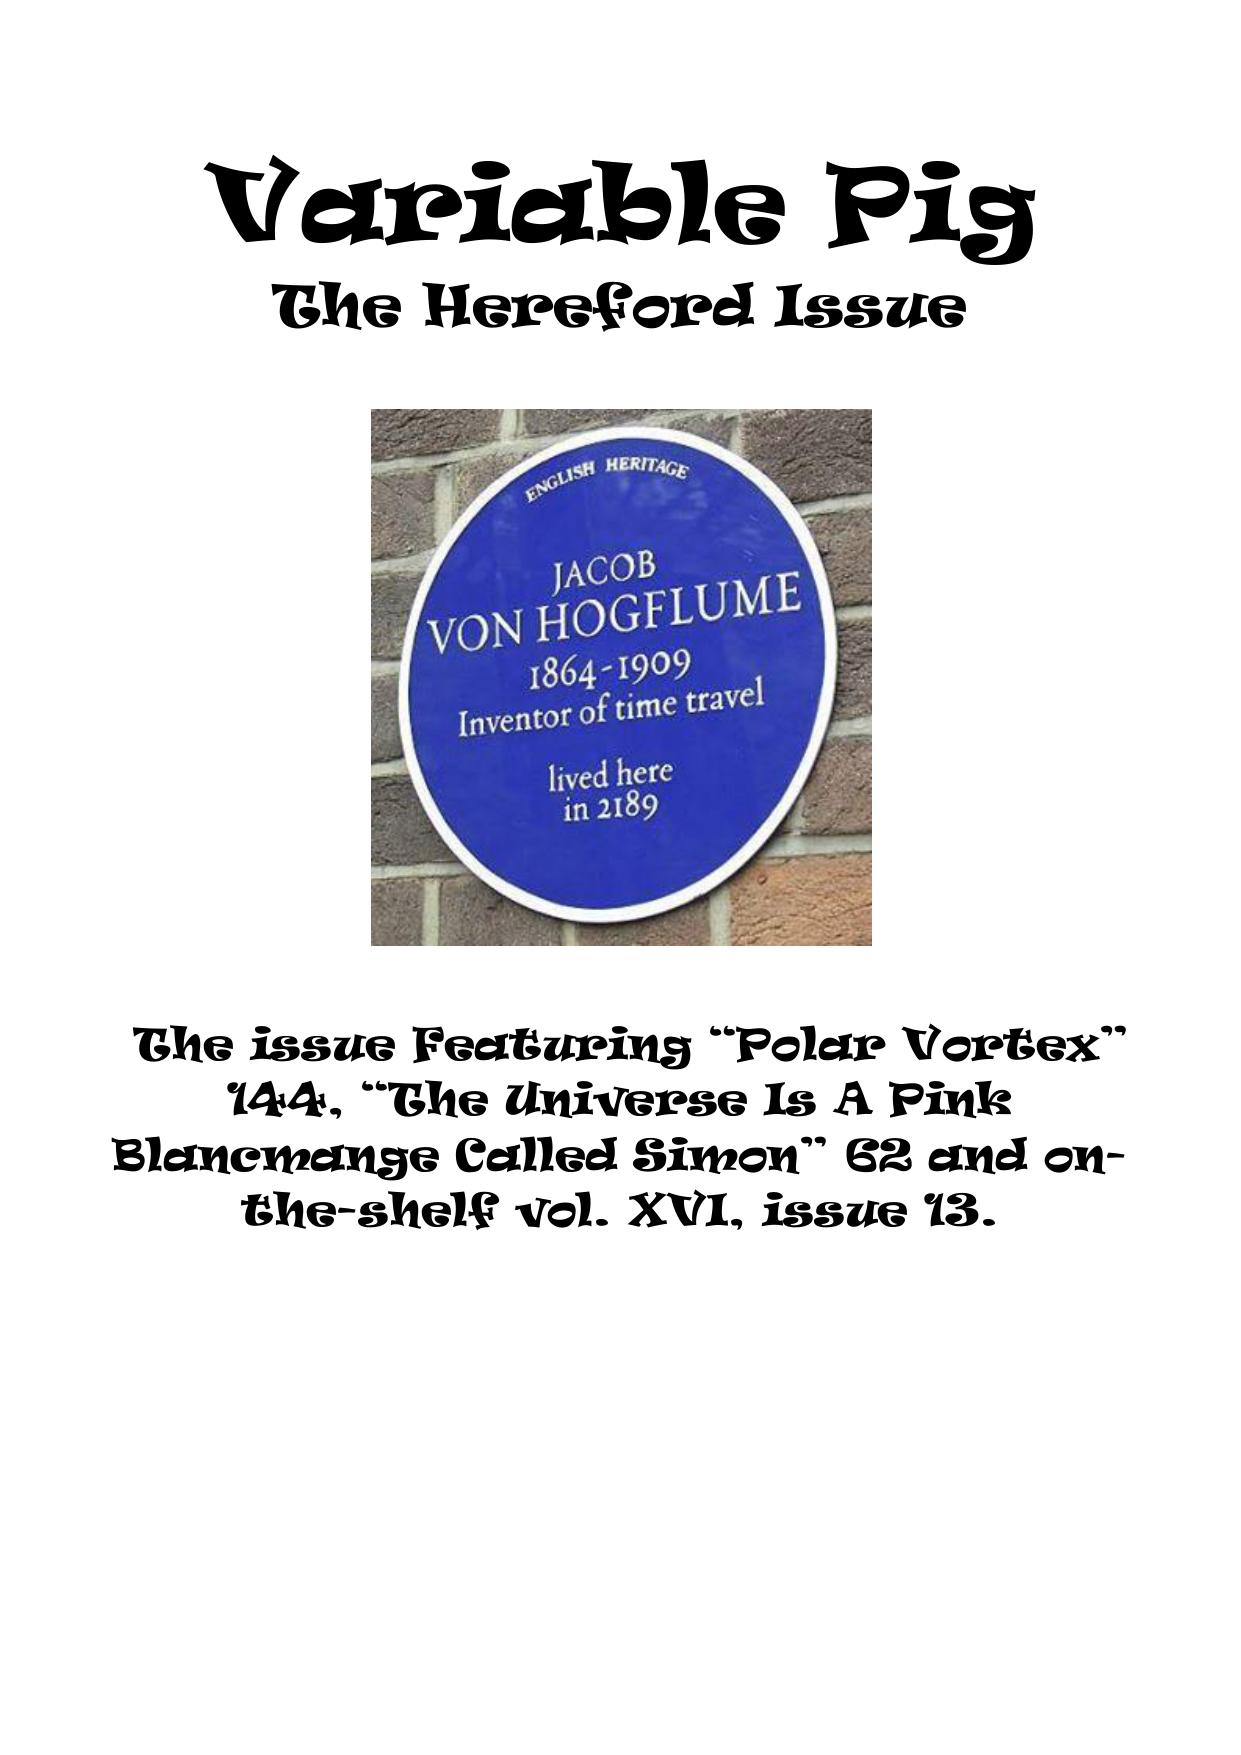 hereford - variable pig Variable Pig | manualzz com